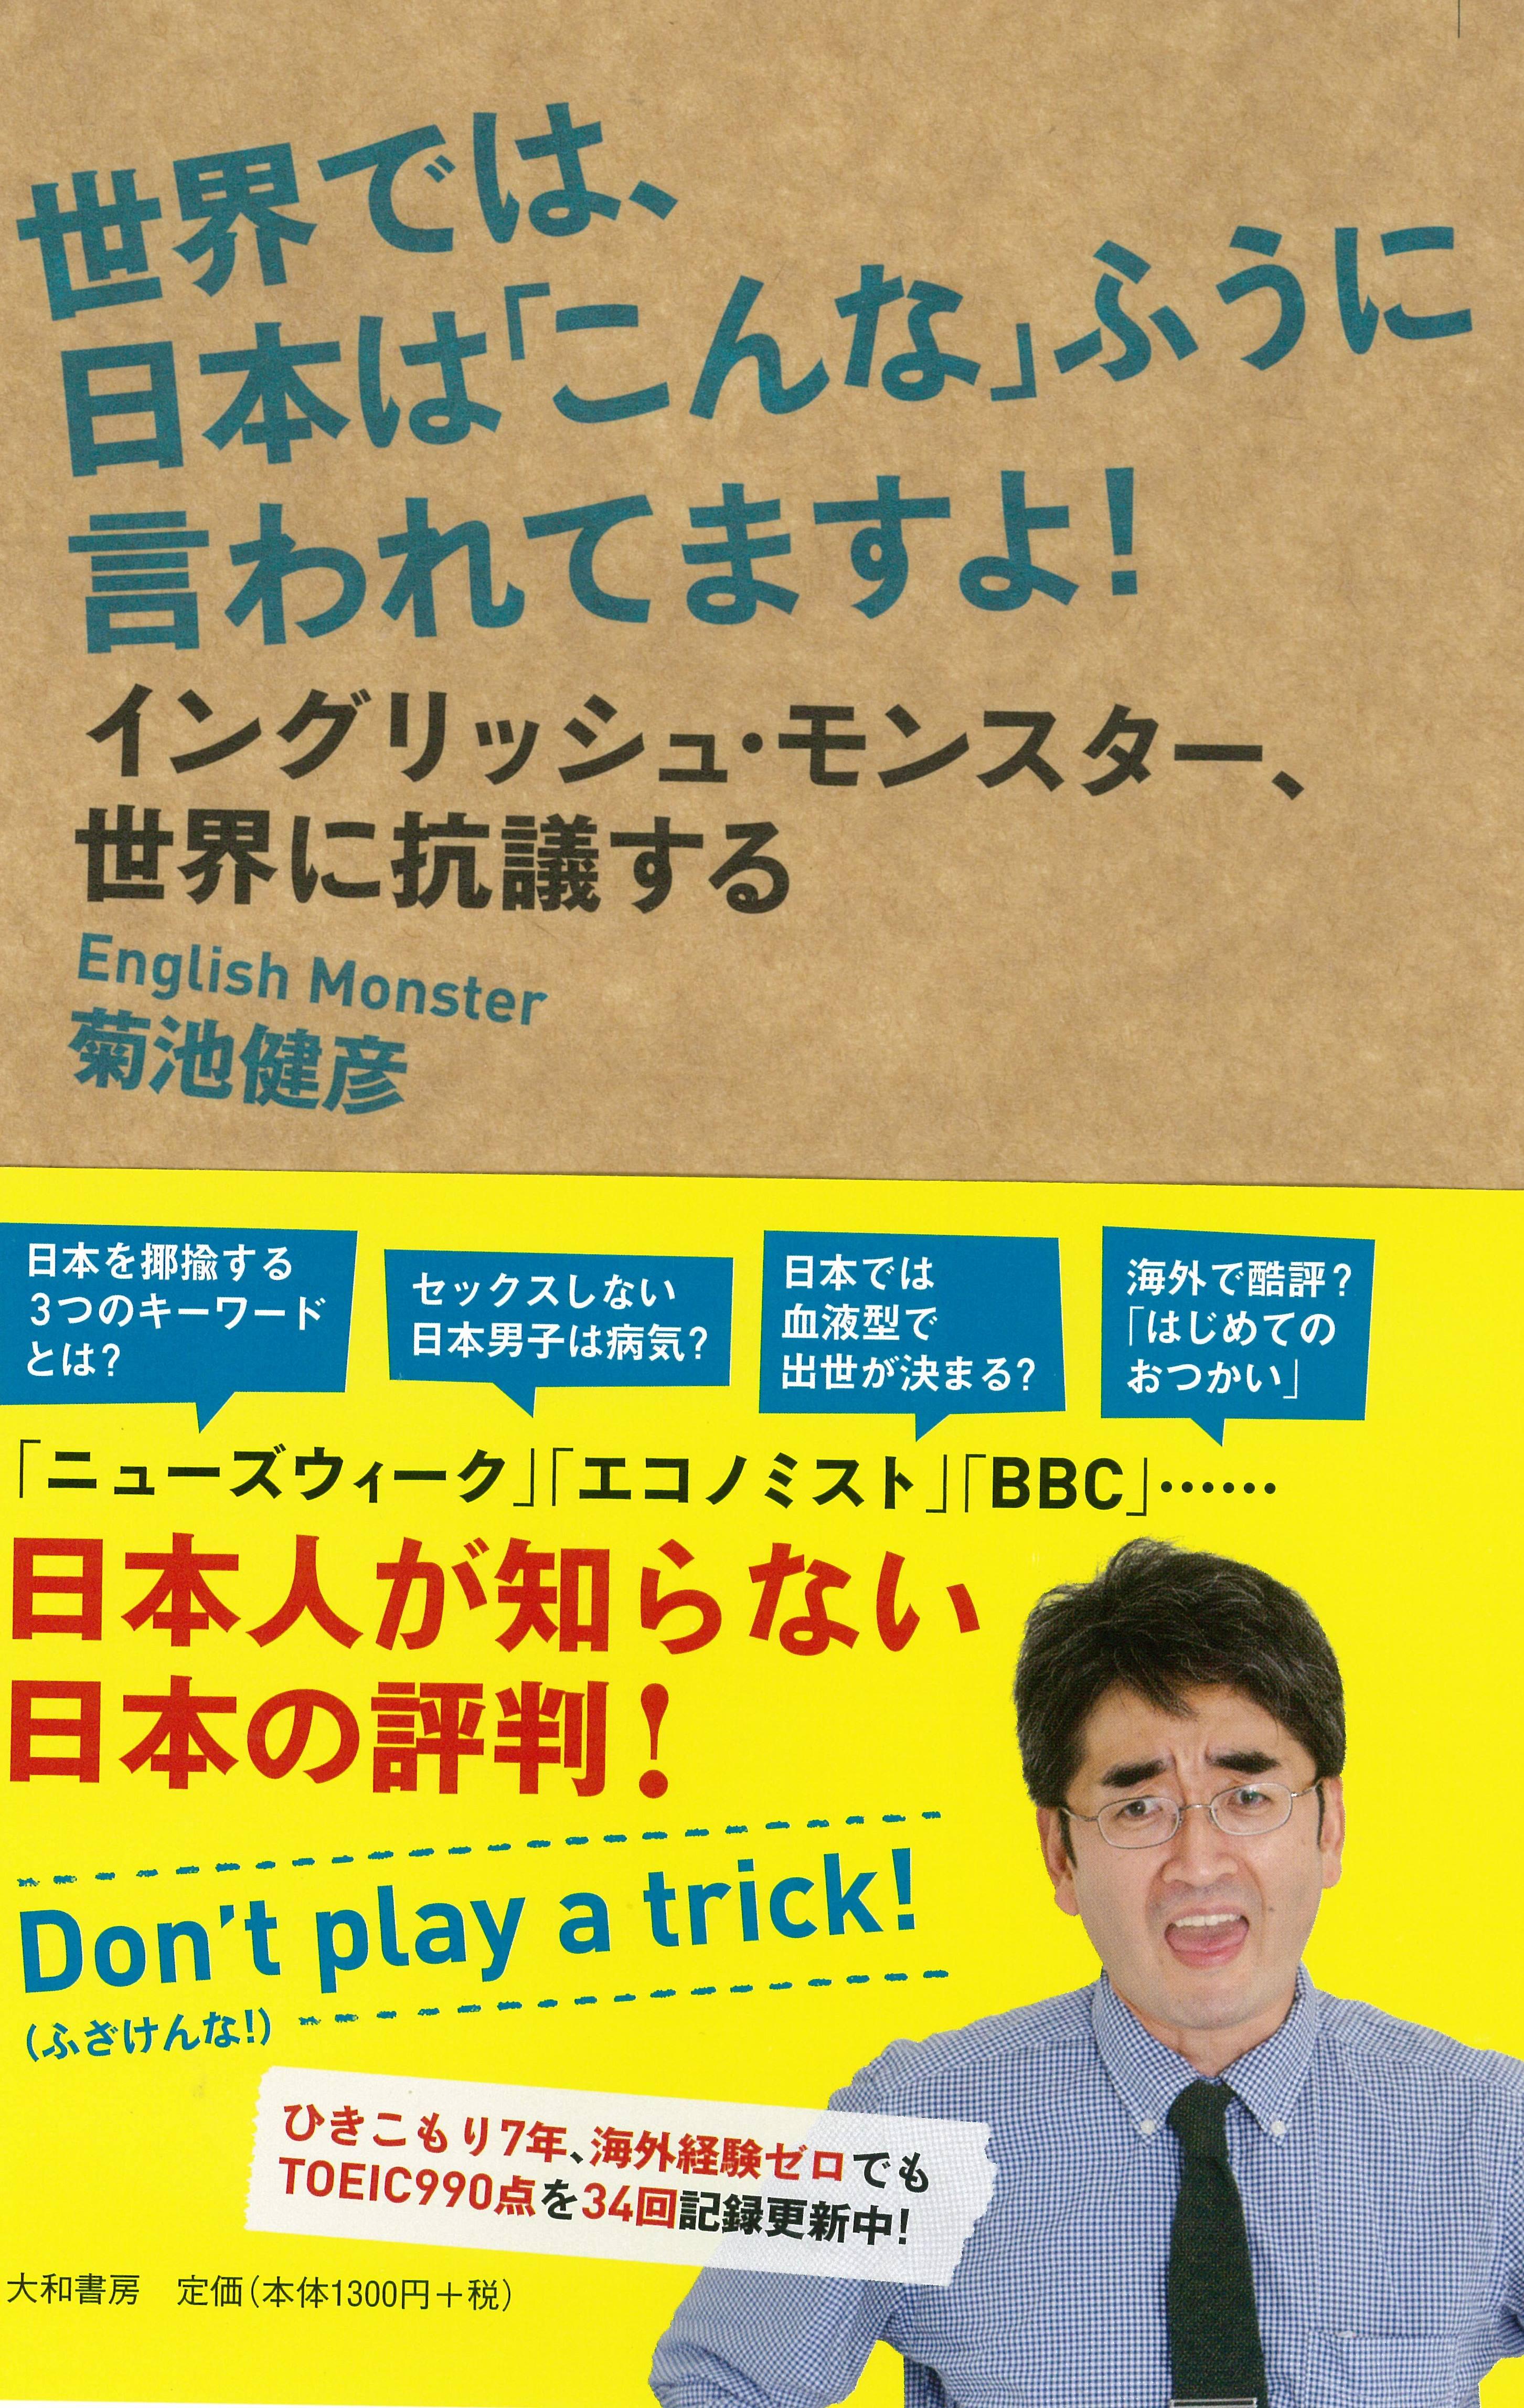 TOEIC驚異!! の990点満点35回更新中!! イングリッシュ・モンスター菊池健彦 待望の新刊!! 世界では、日本は「こんな」ふうに言われてますよ!イングリッシュ・モンスター、世界に抗議する